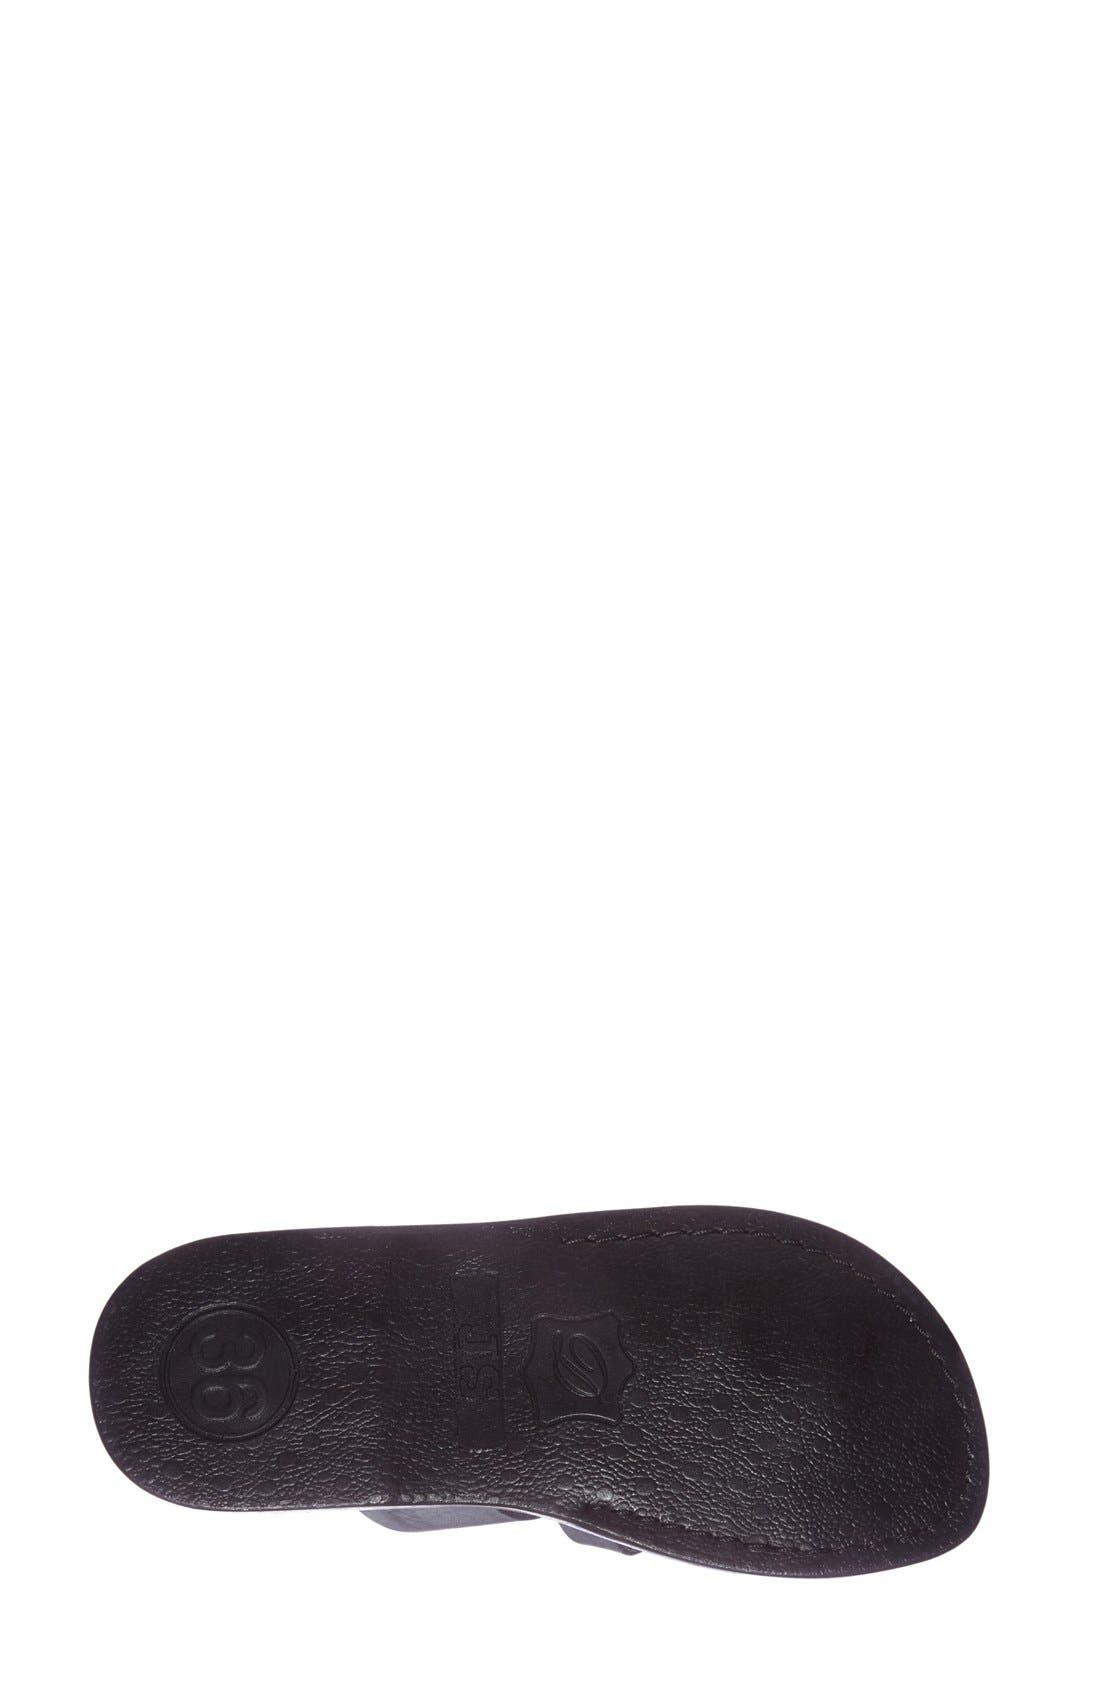 'The Good Shepard' Leather Sandal,                             Alternate thumbnail 27, color,